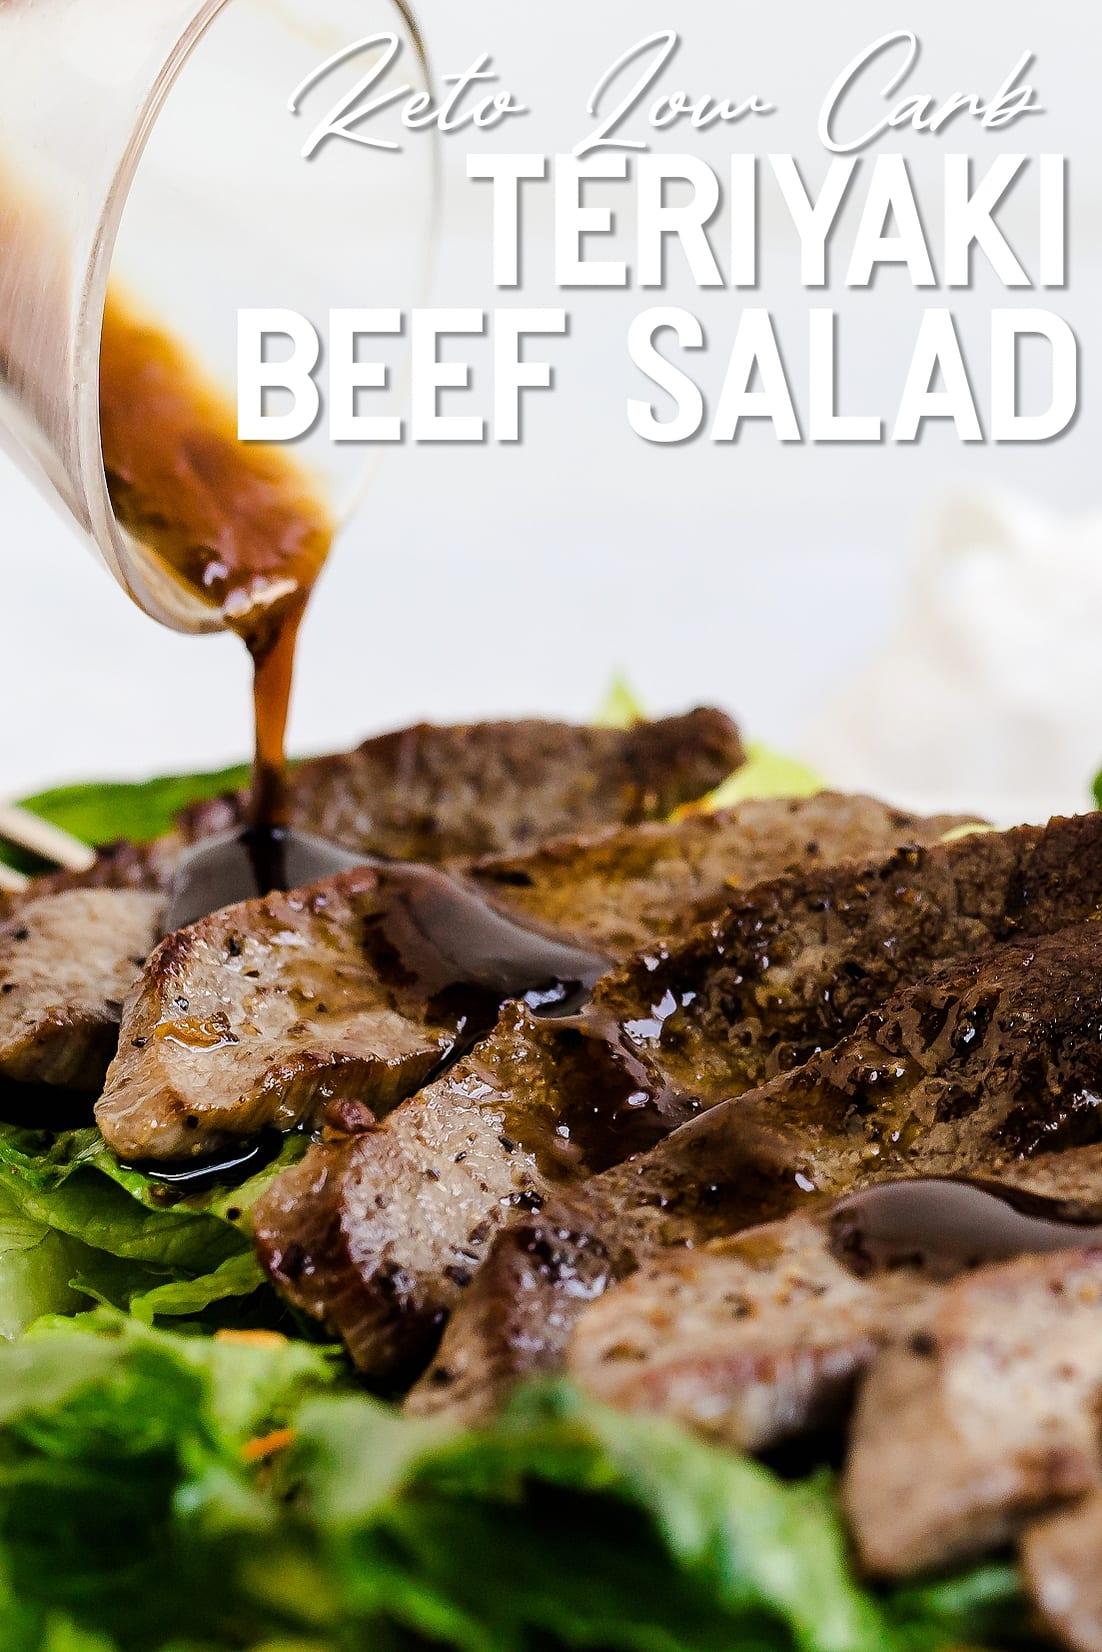 Teriyaki Beef Salad with sauce being poured